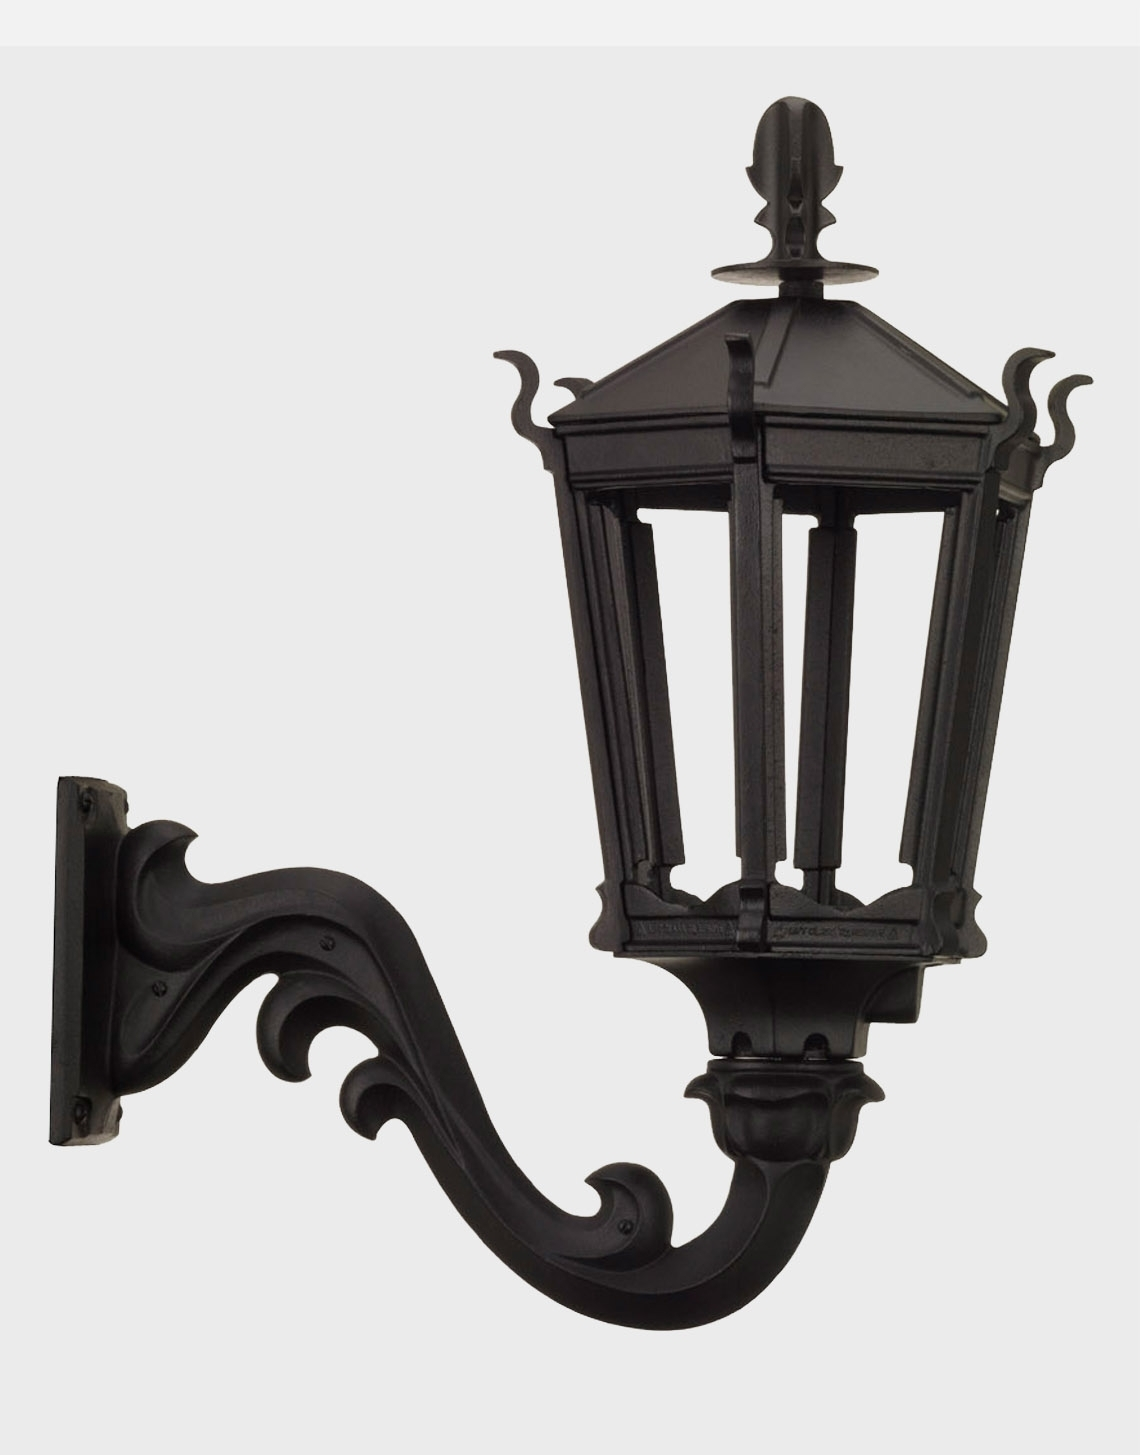 Gothic Outdoor Wall Lighting • Outdoor Lighting Pertaining To Gothic Outdoor Wall Lighting (#5 of 15)